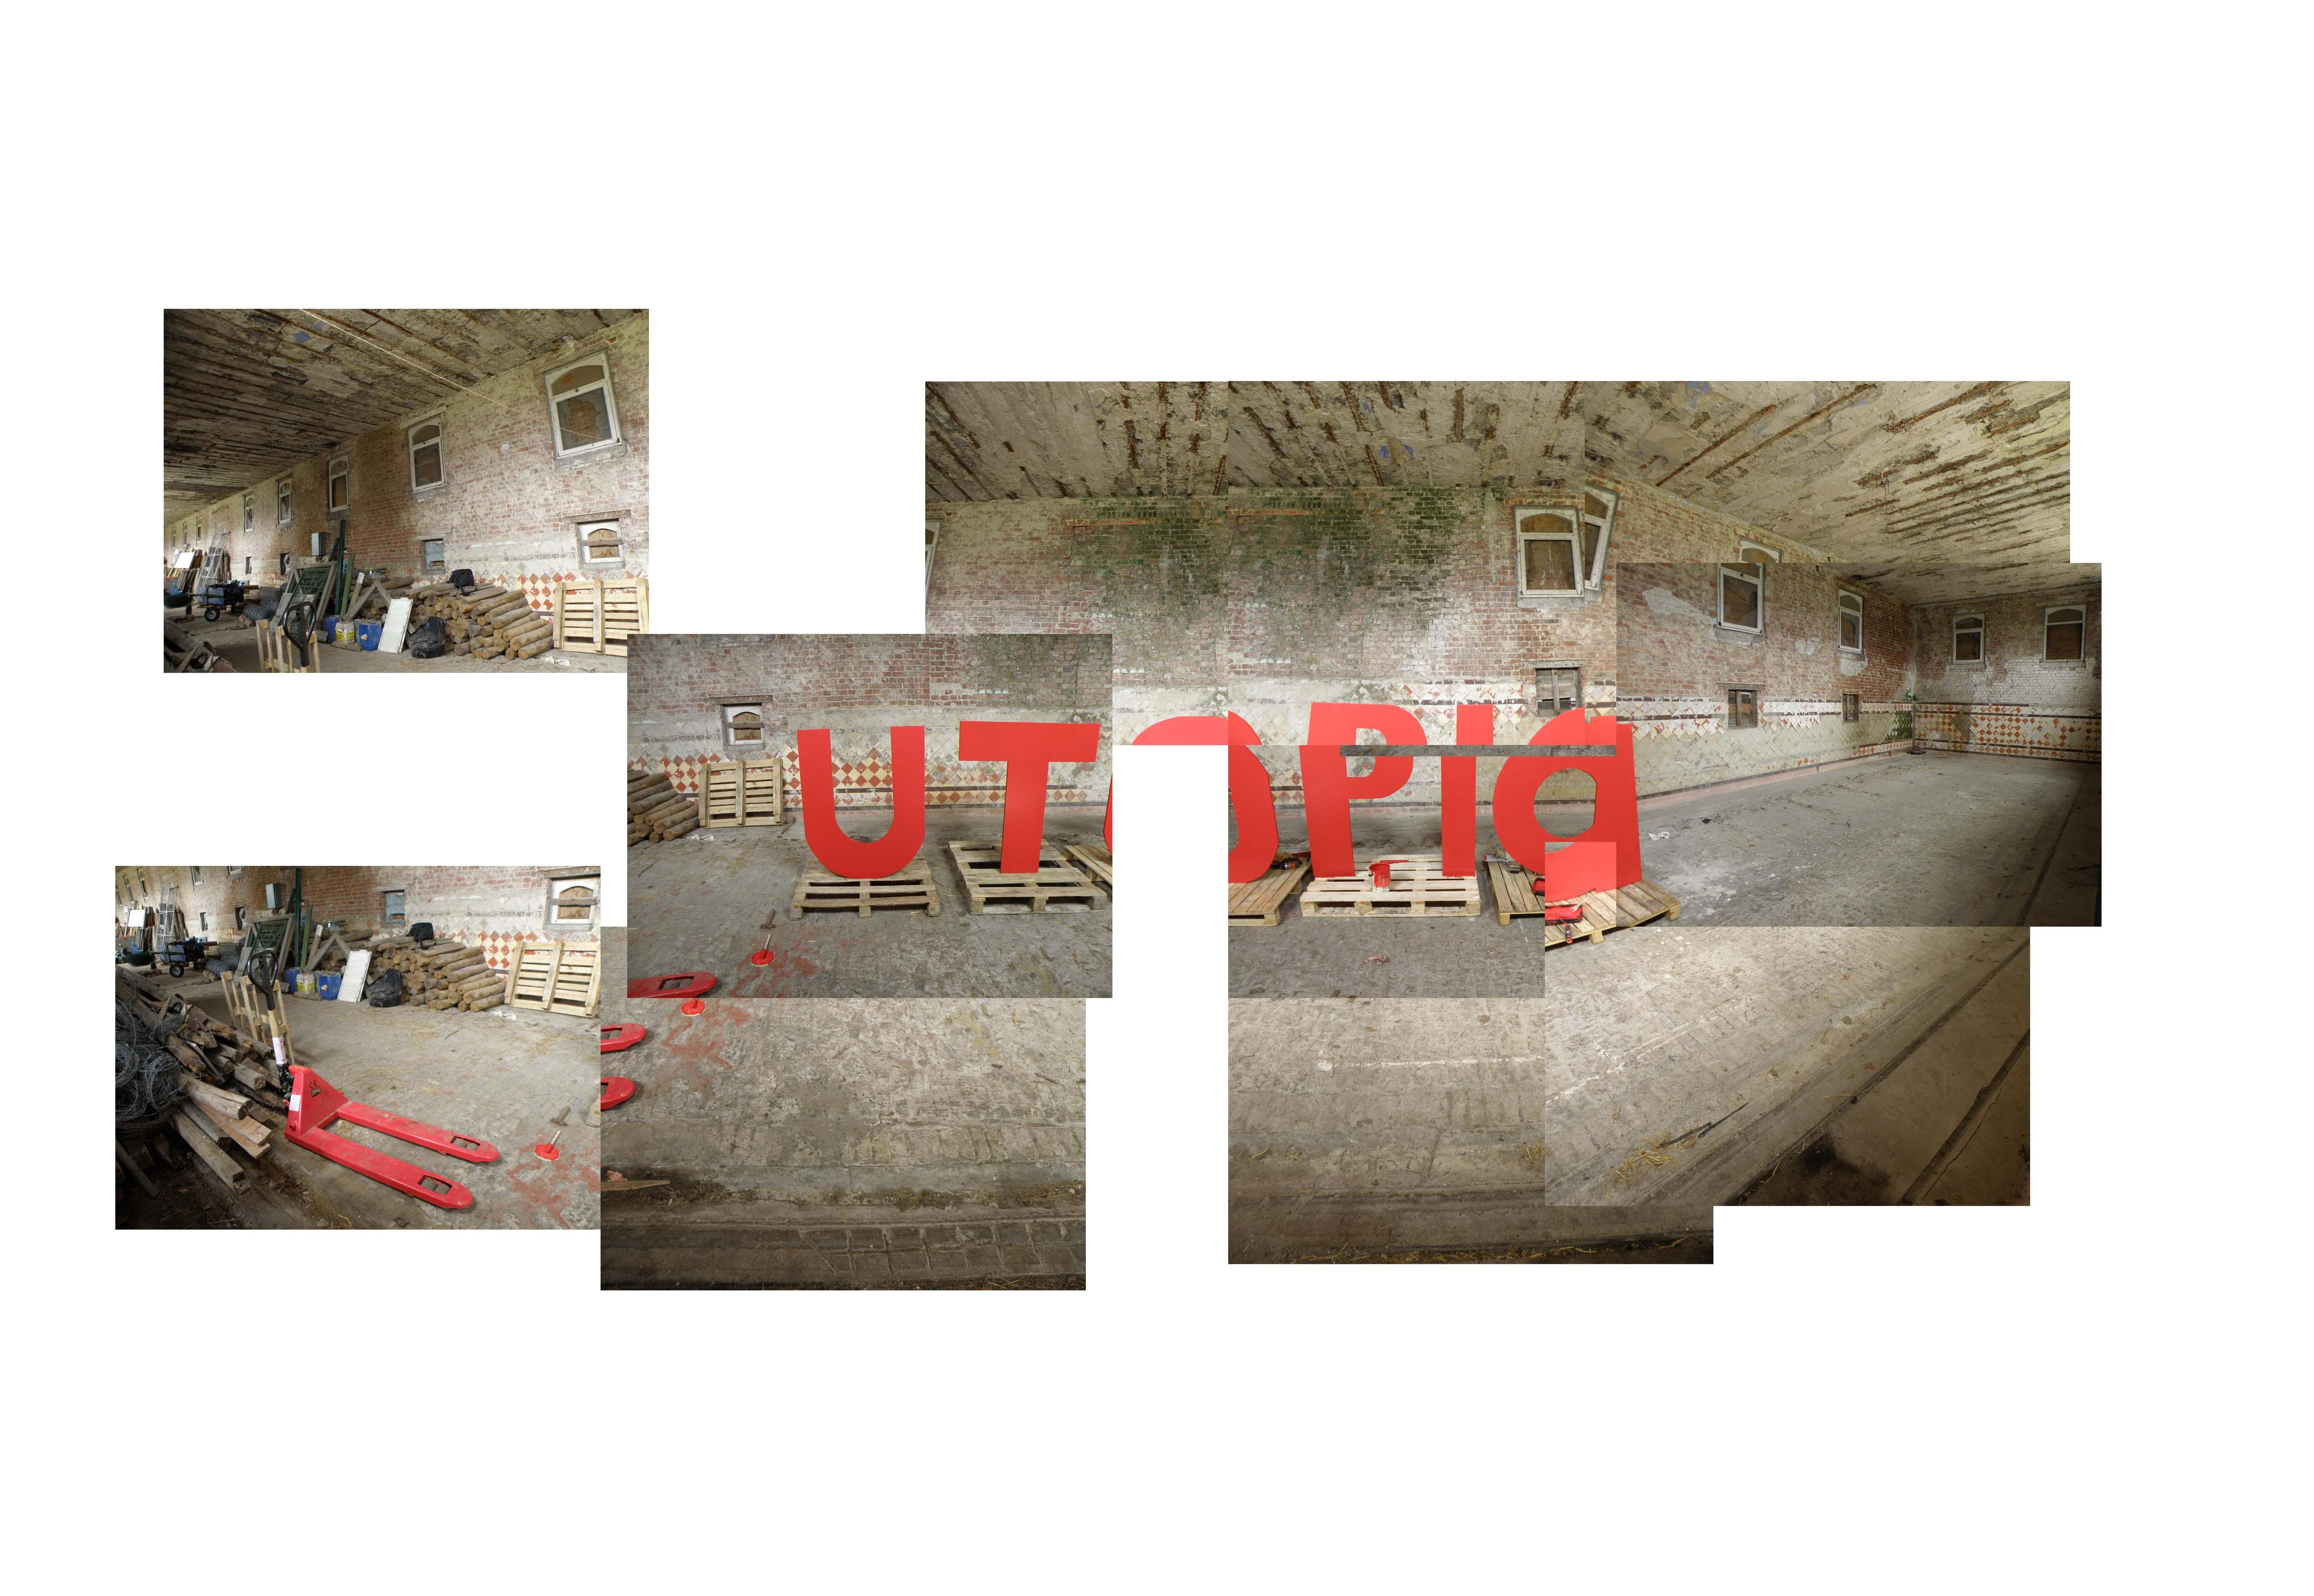 utopia hockneyed